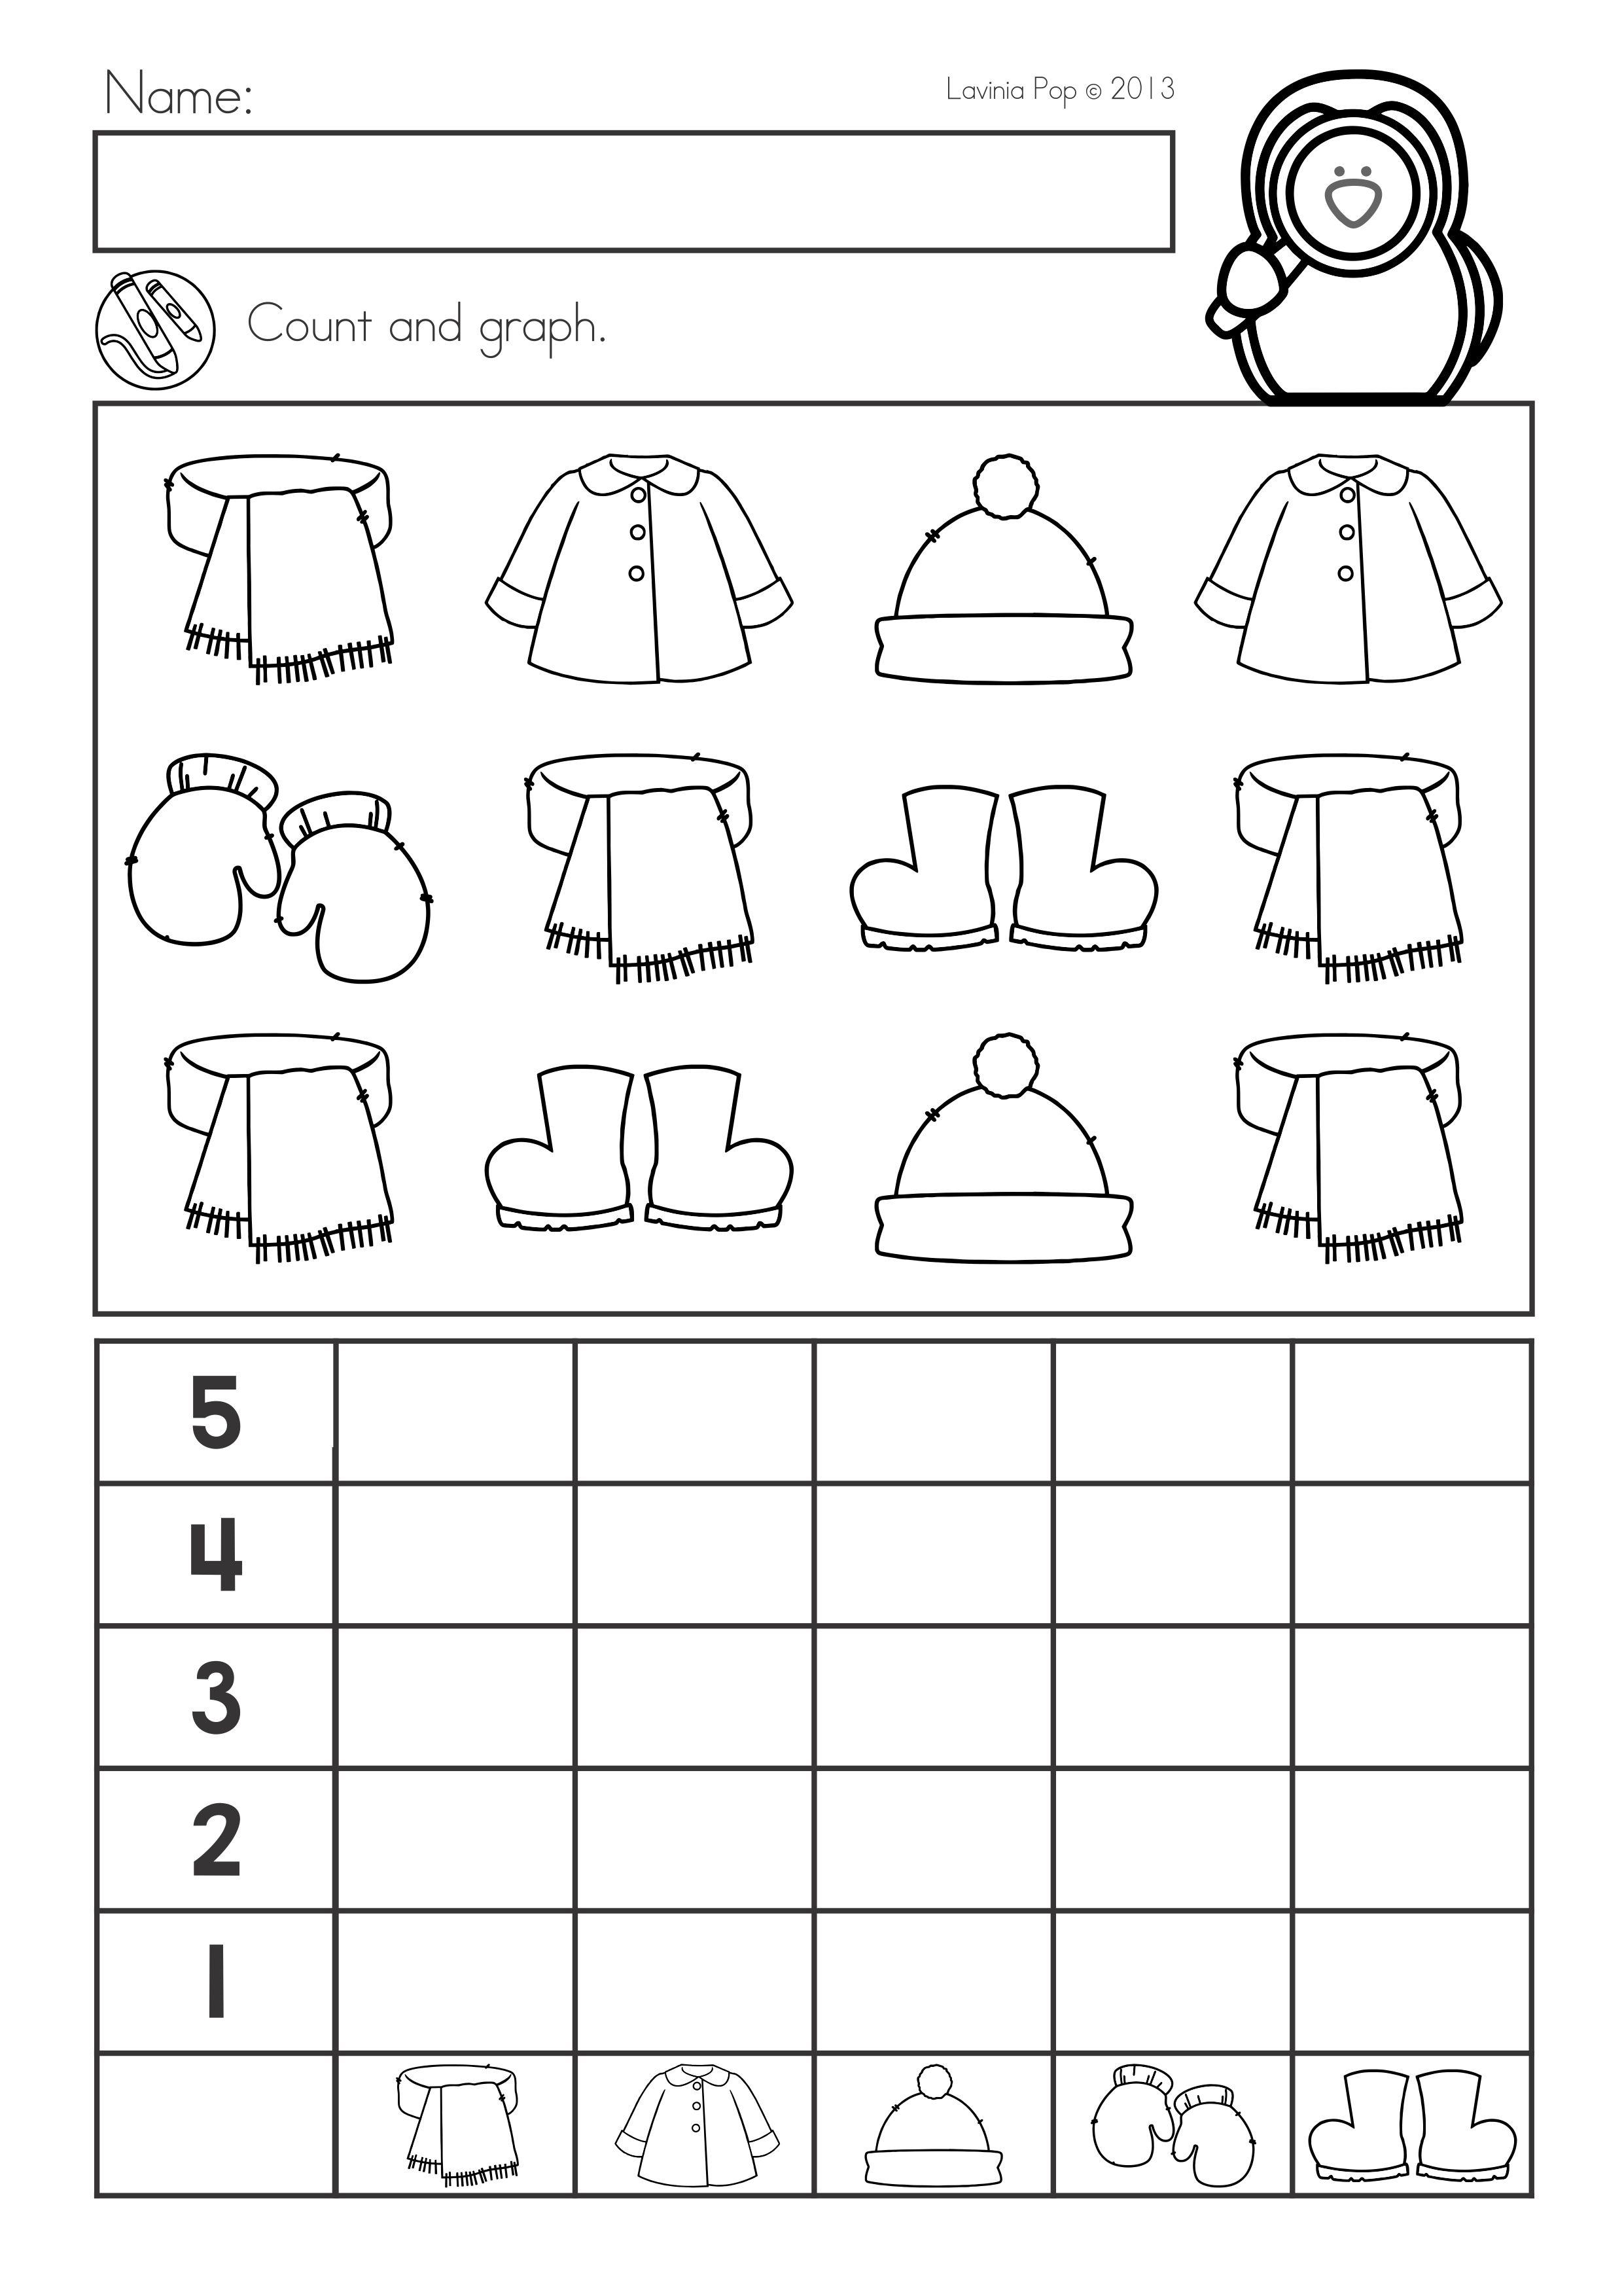 Winter Math Worksheets Activities No Prep For Kindergarten Count And Graph Winter Math Worksheets Winter Math Kindergarten Math Activities